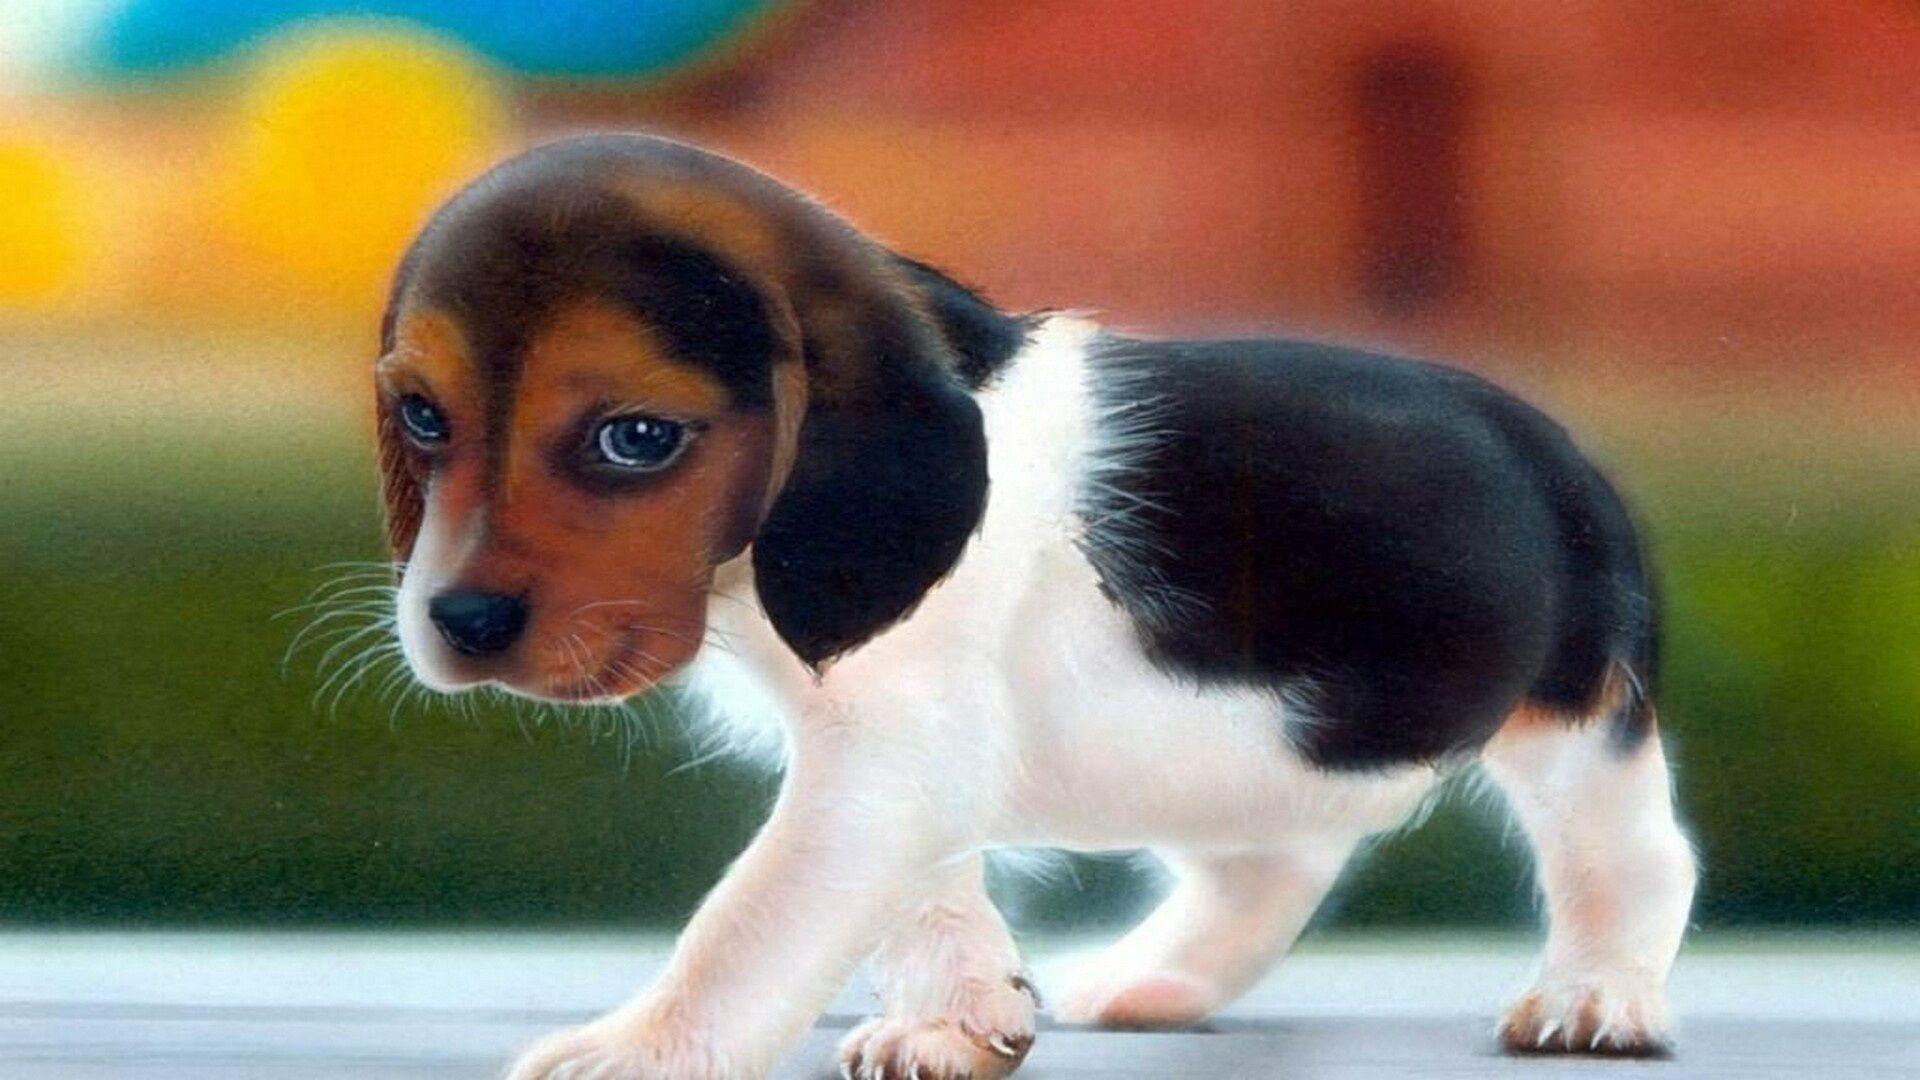 sad-cute-dog-high-resolution-wallpaper-for-desktop-background-download-dog-photos-free